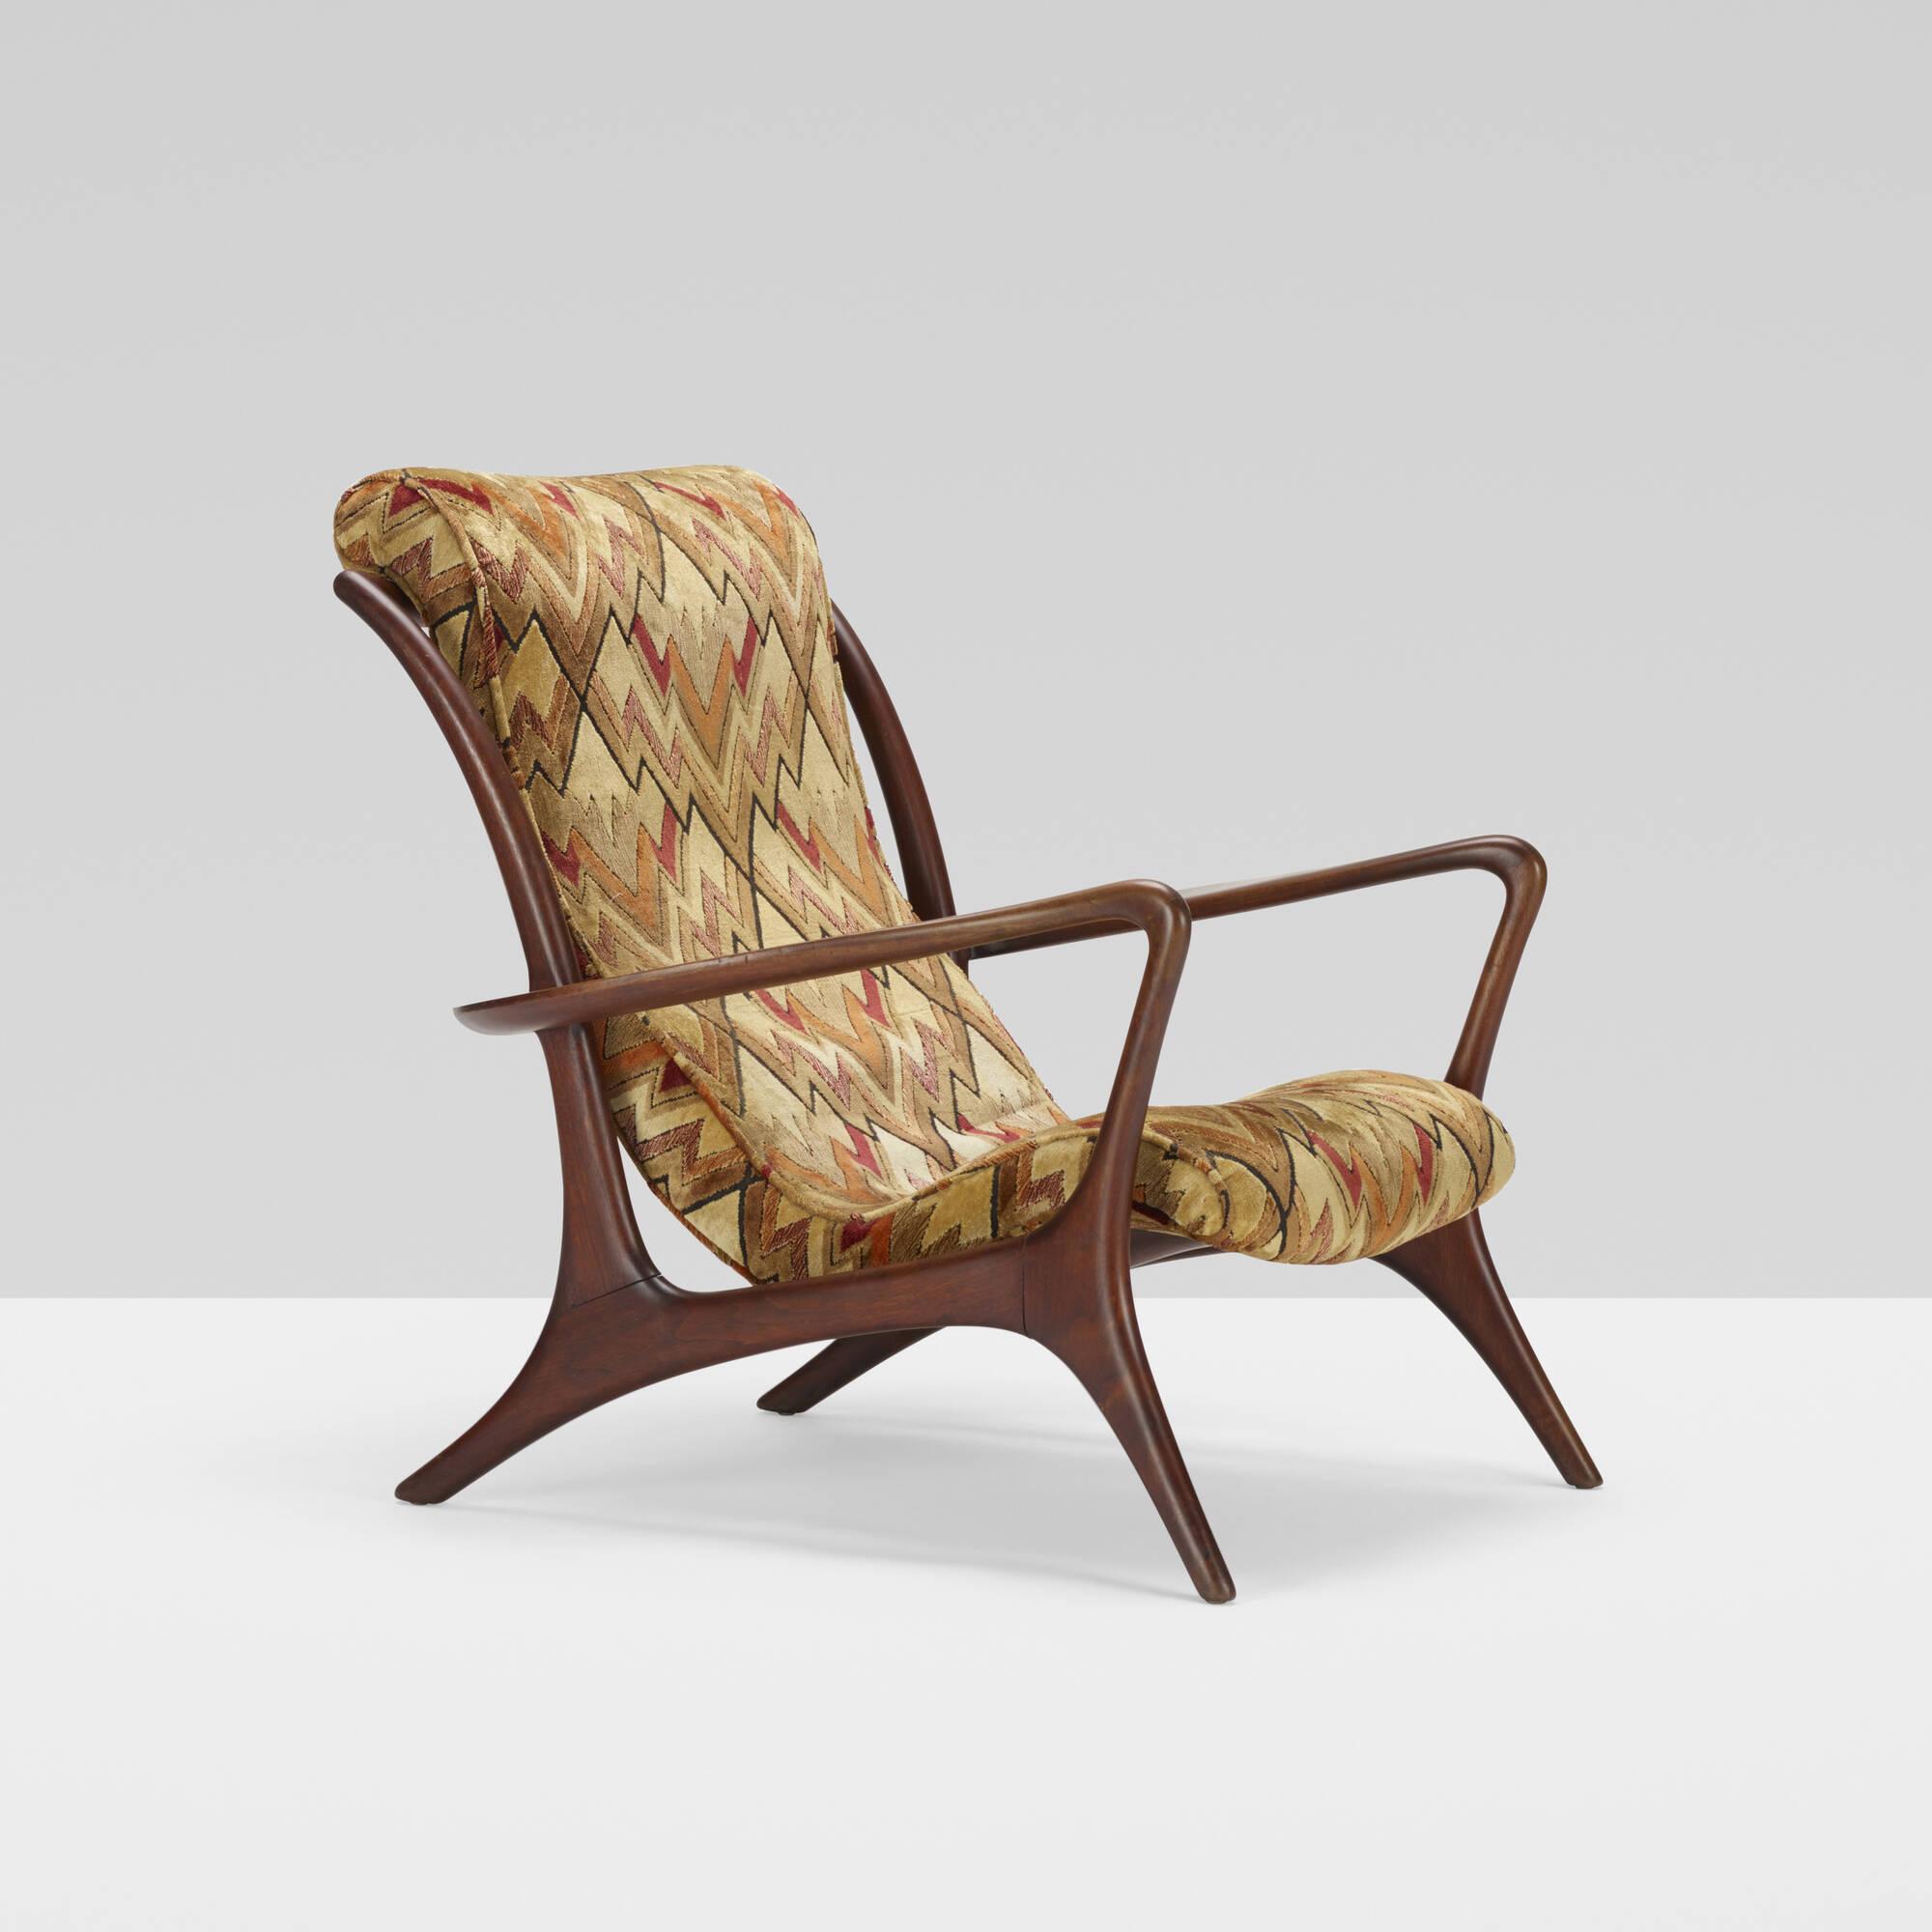 409: Vladimir Kagan / High Back Sculptured Contoured chair (3 of 3)